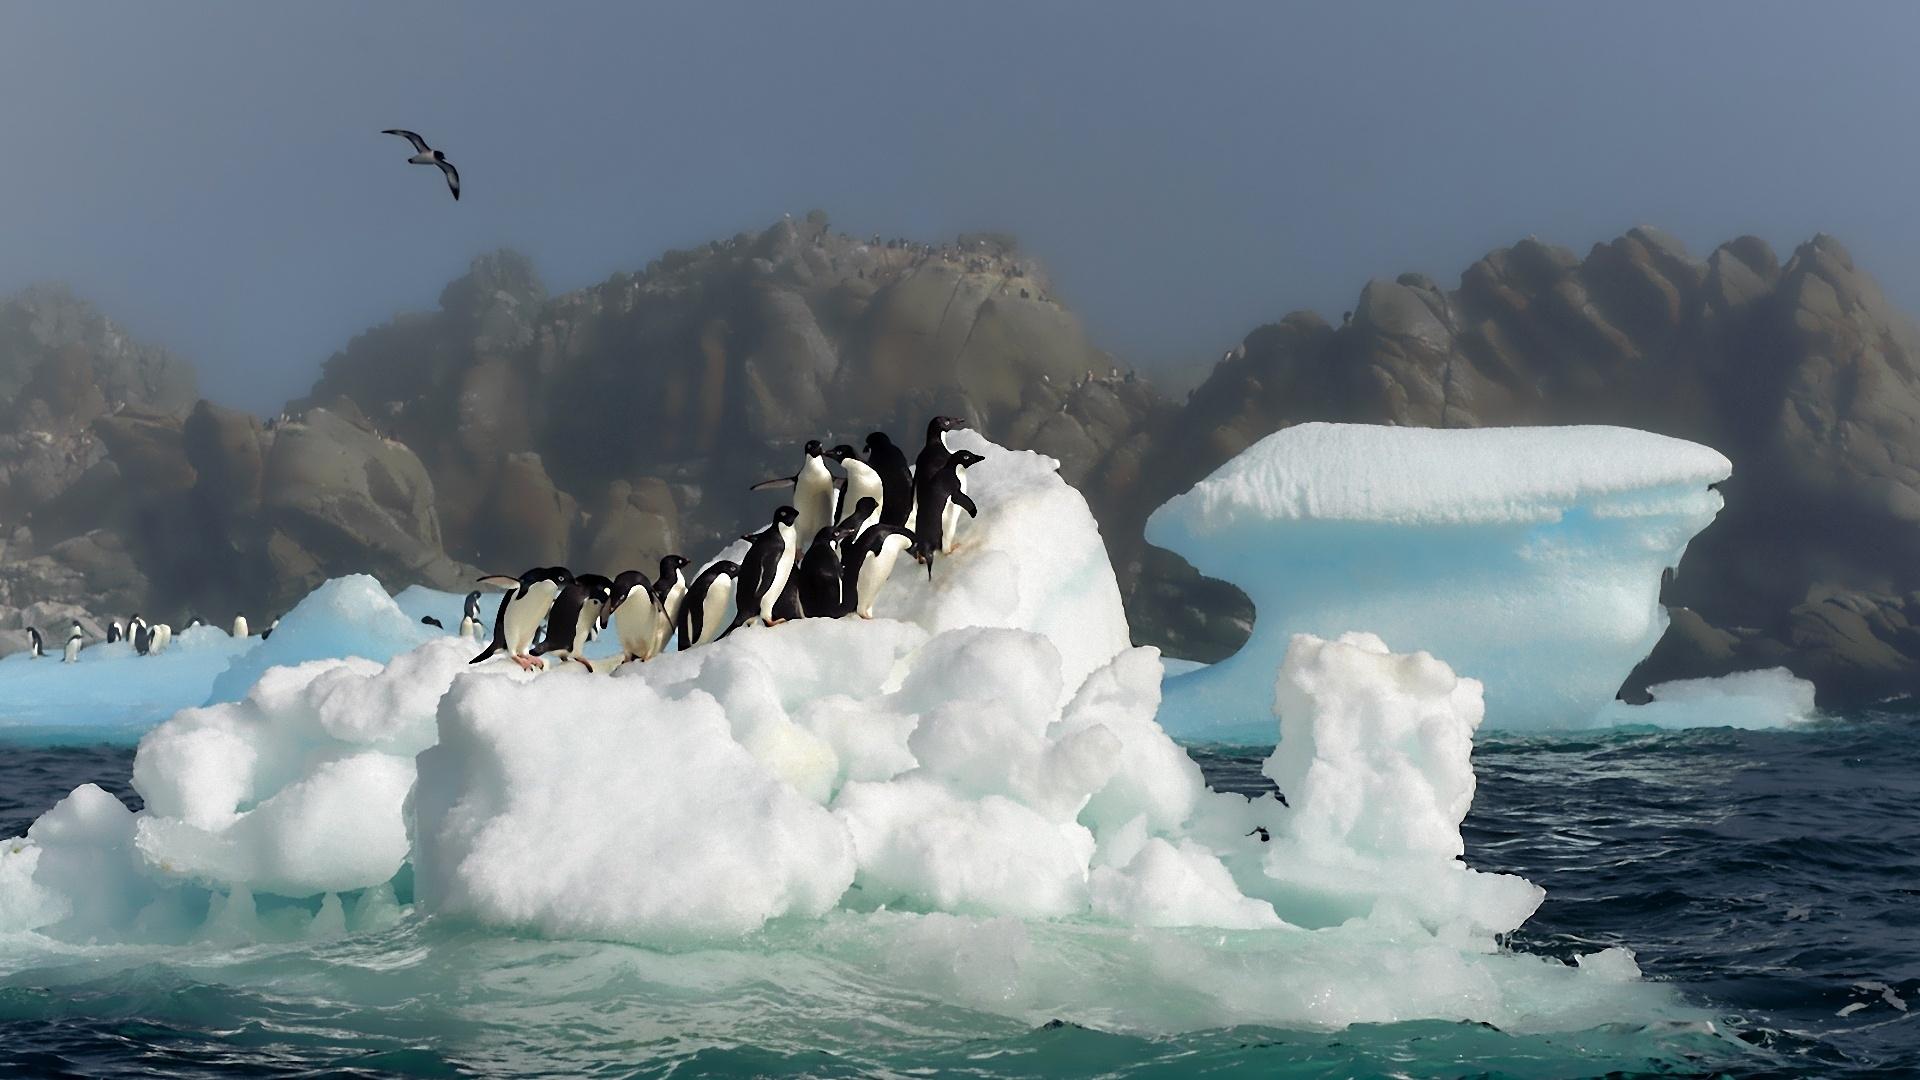 Many Penguins On A Iceberg Antarctica Wallpaper